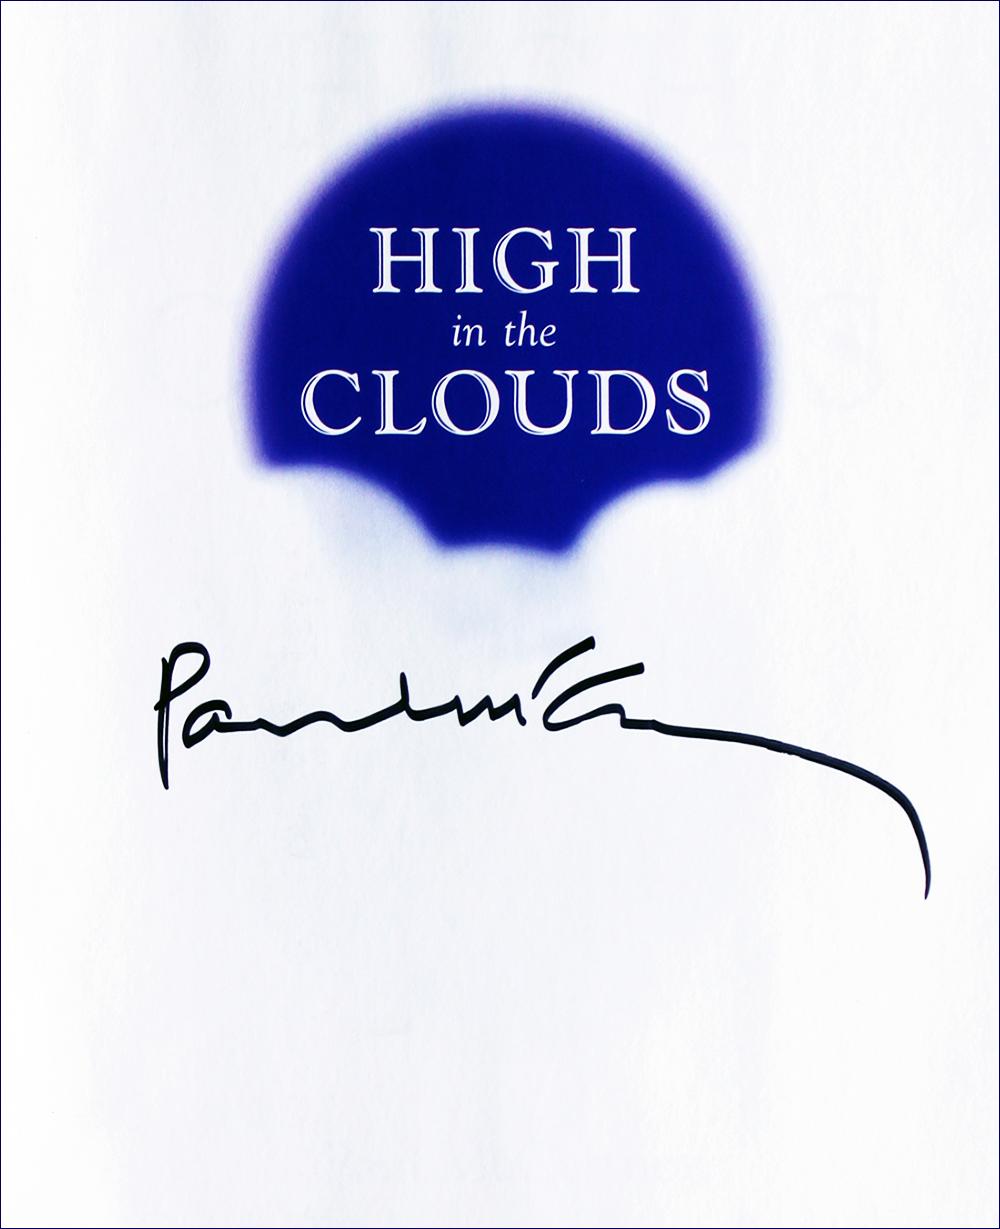 Book - High in the Clouds - Paul McCartney - Inside #3